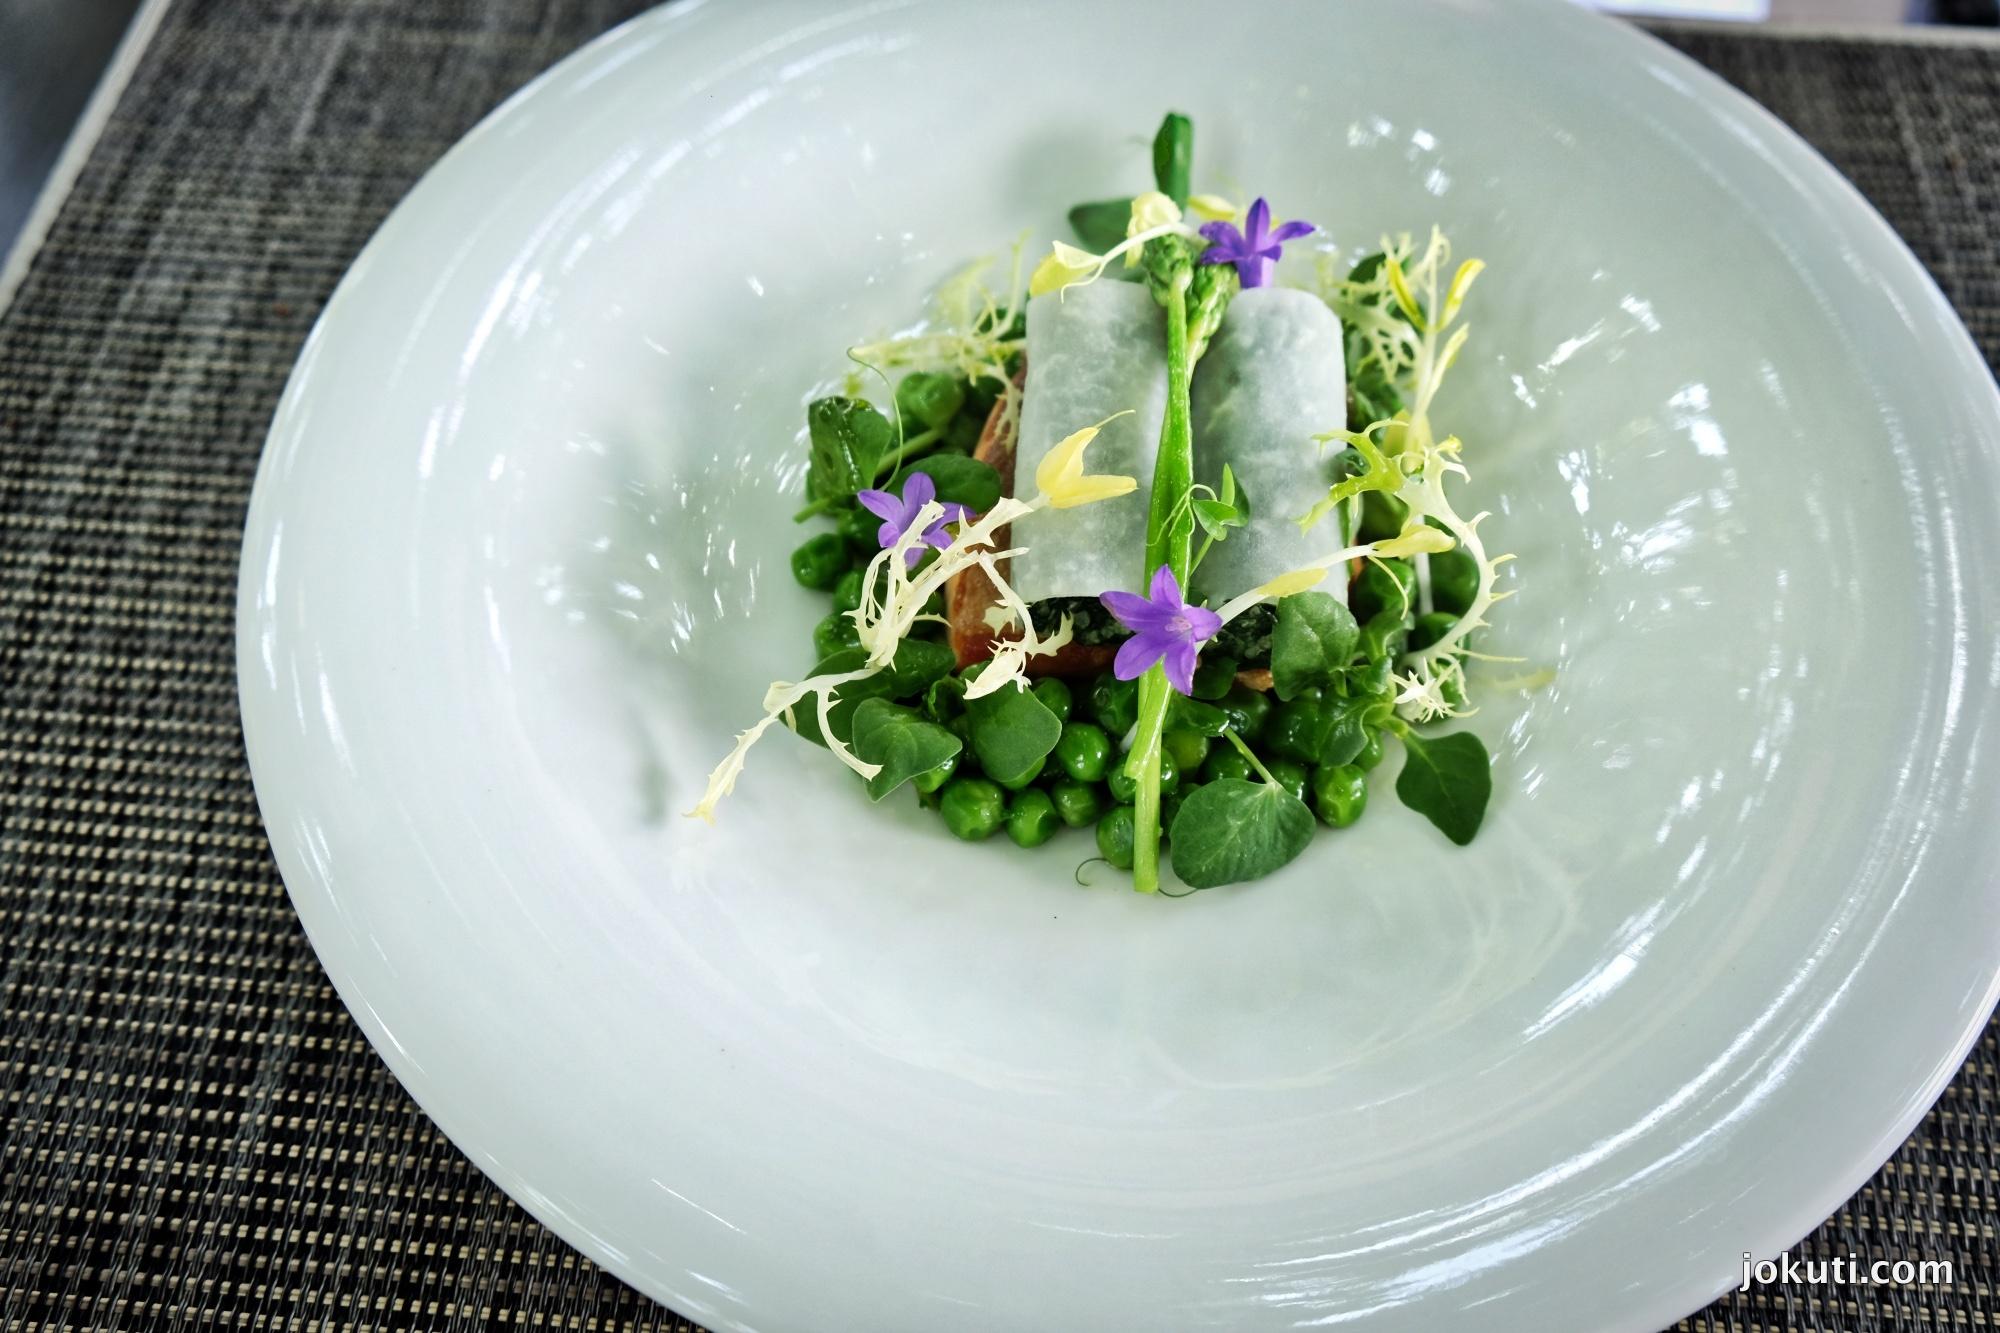 dscf6955_platan_tata_pesti_restaurant_denmark_vilagevo_jokuti_andras_l_l.jpg